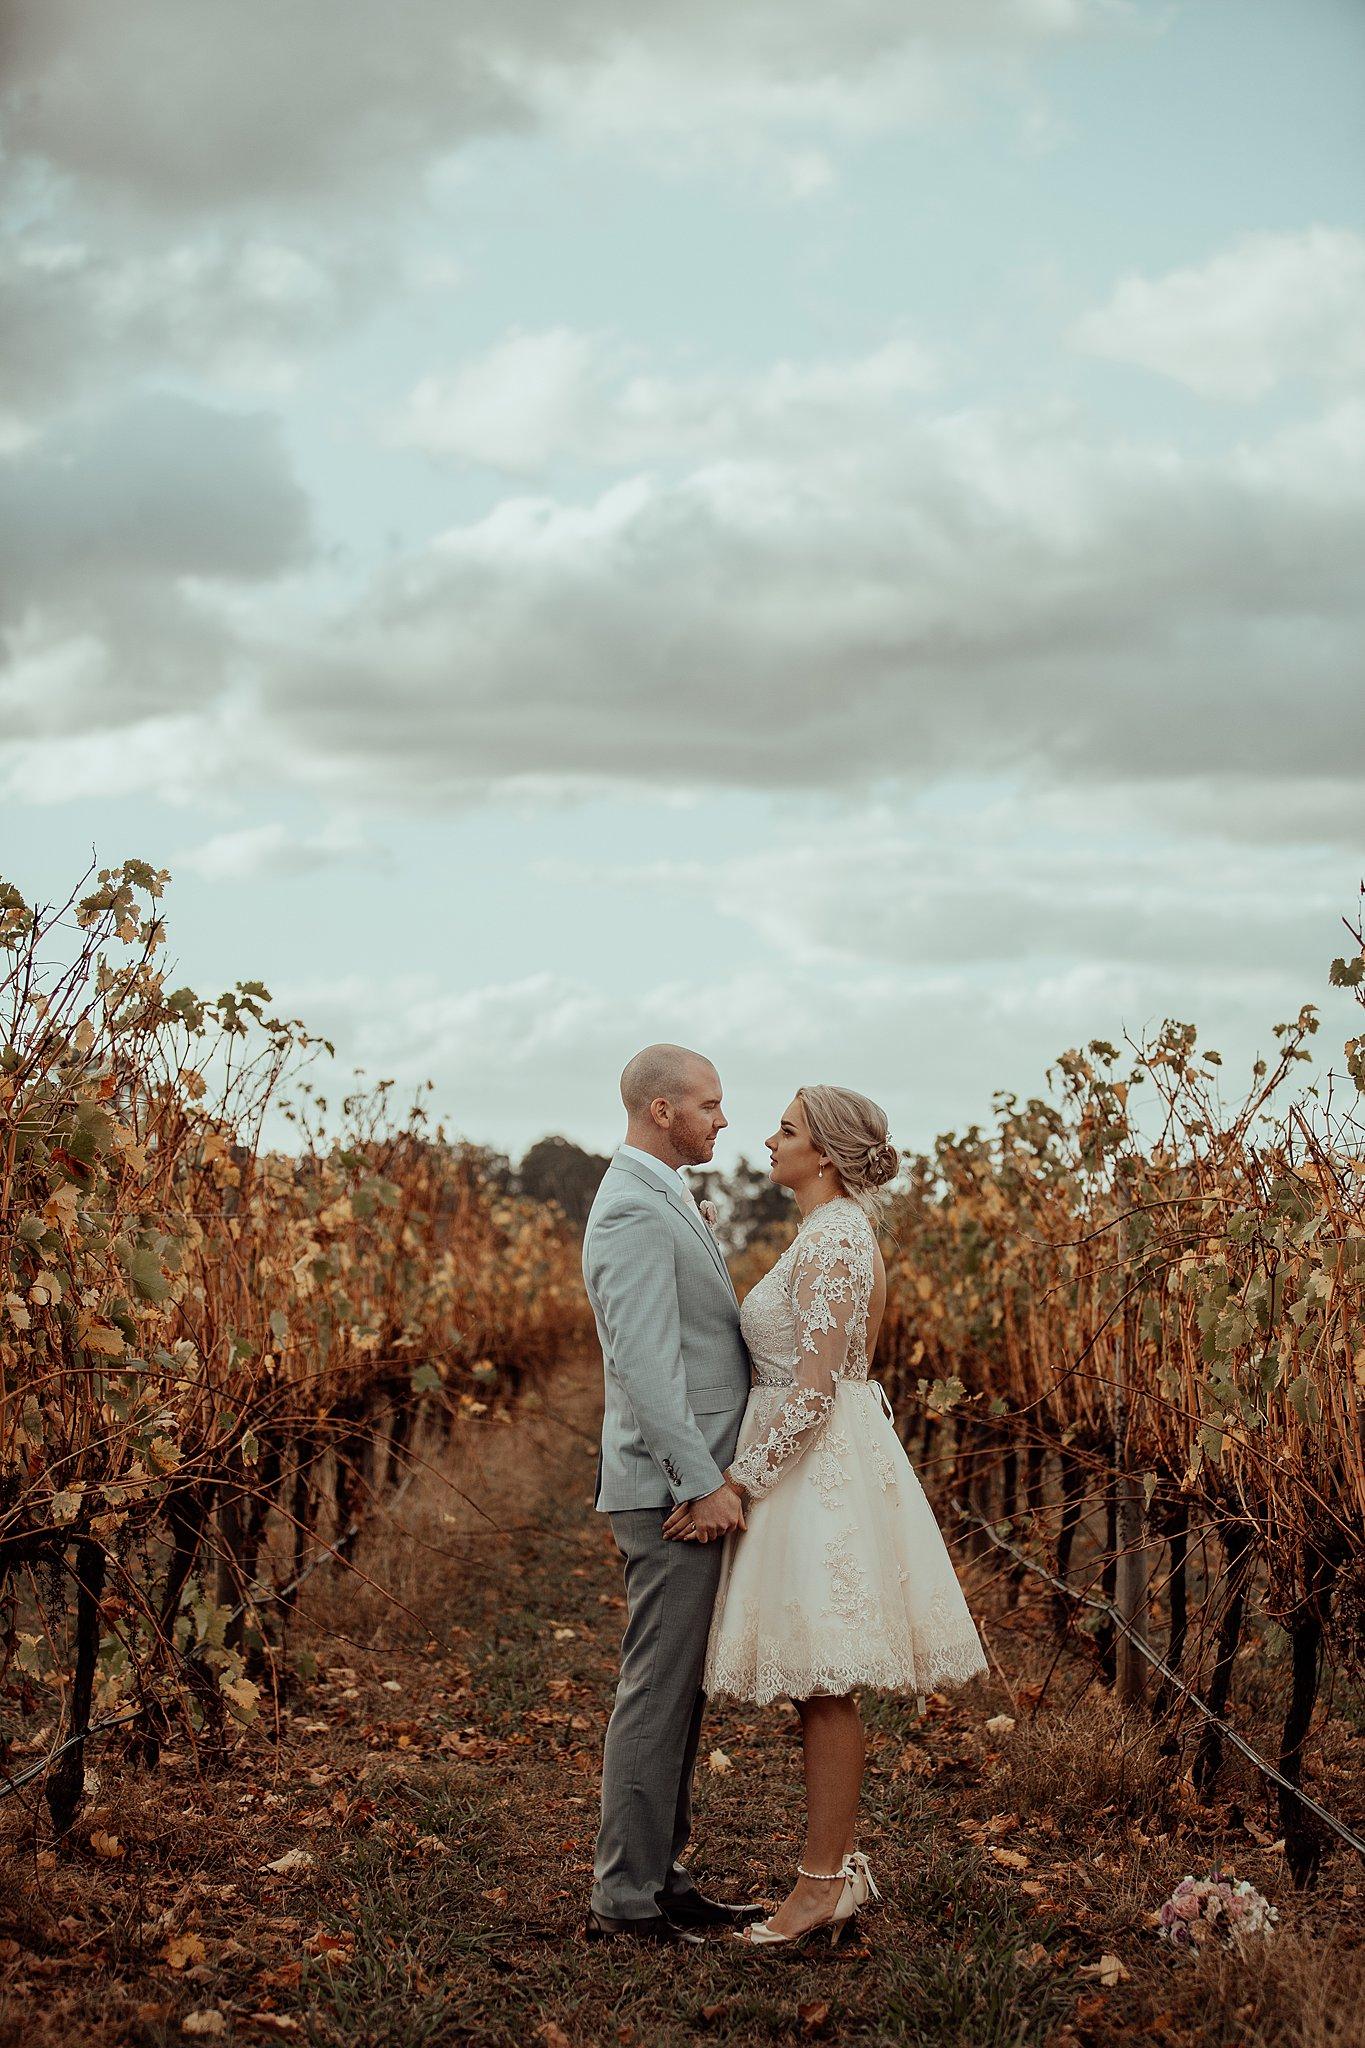 mickalathomas_puremacphotography_weddingphotographer_couplephotographer_Sheppartonphotographer_3452.jpg